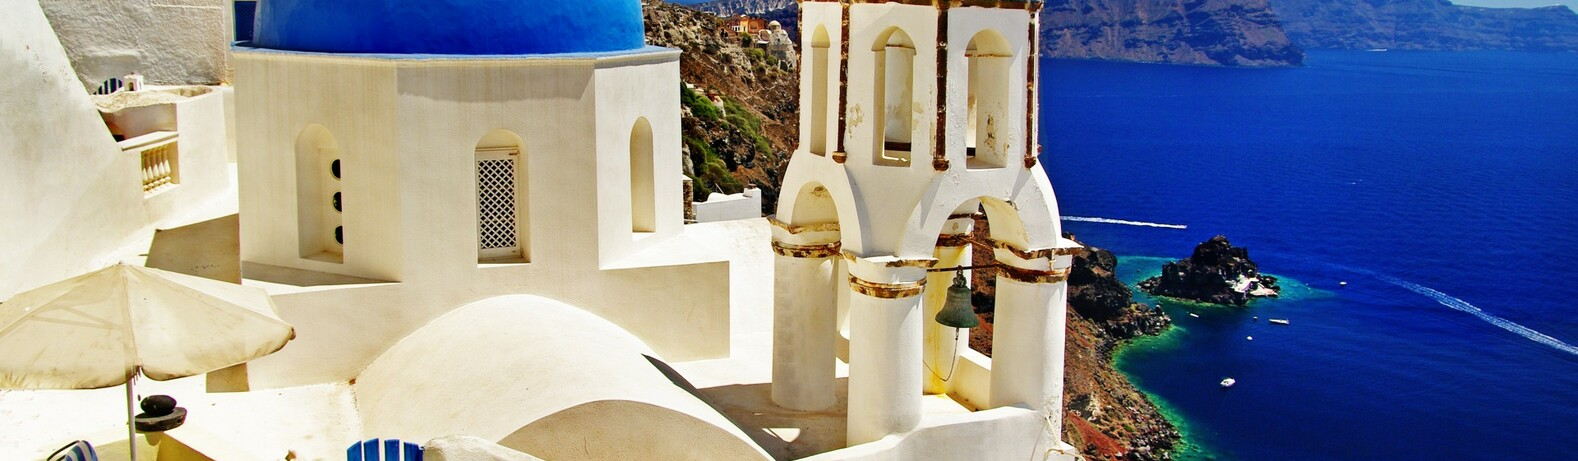 Grčki otoci